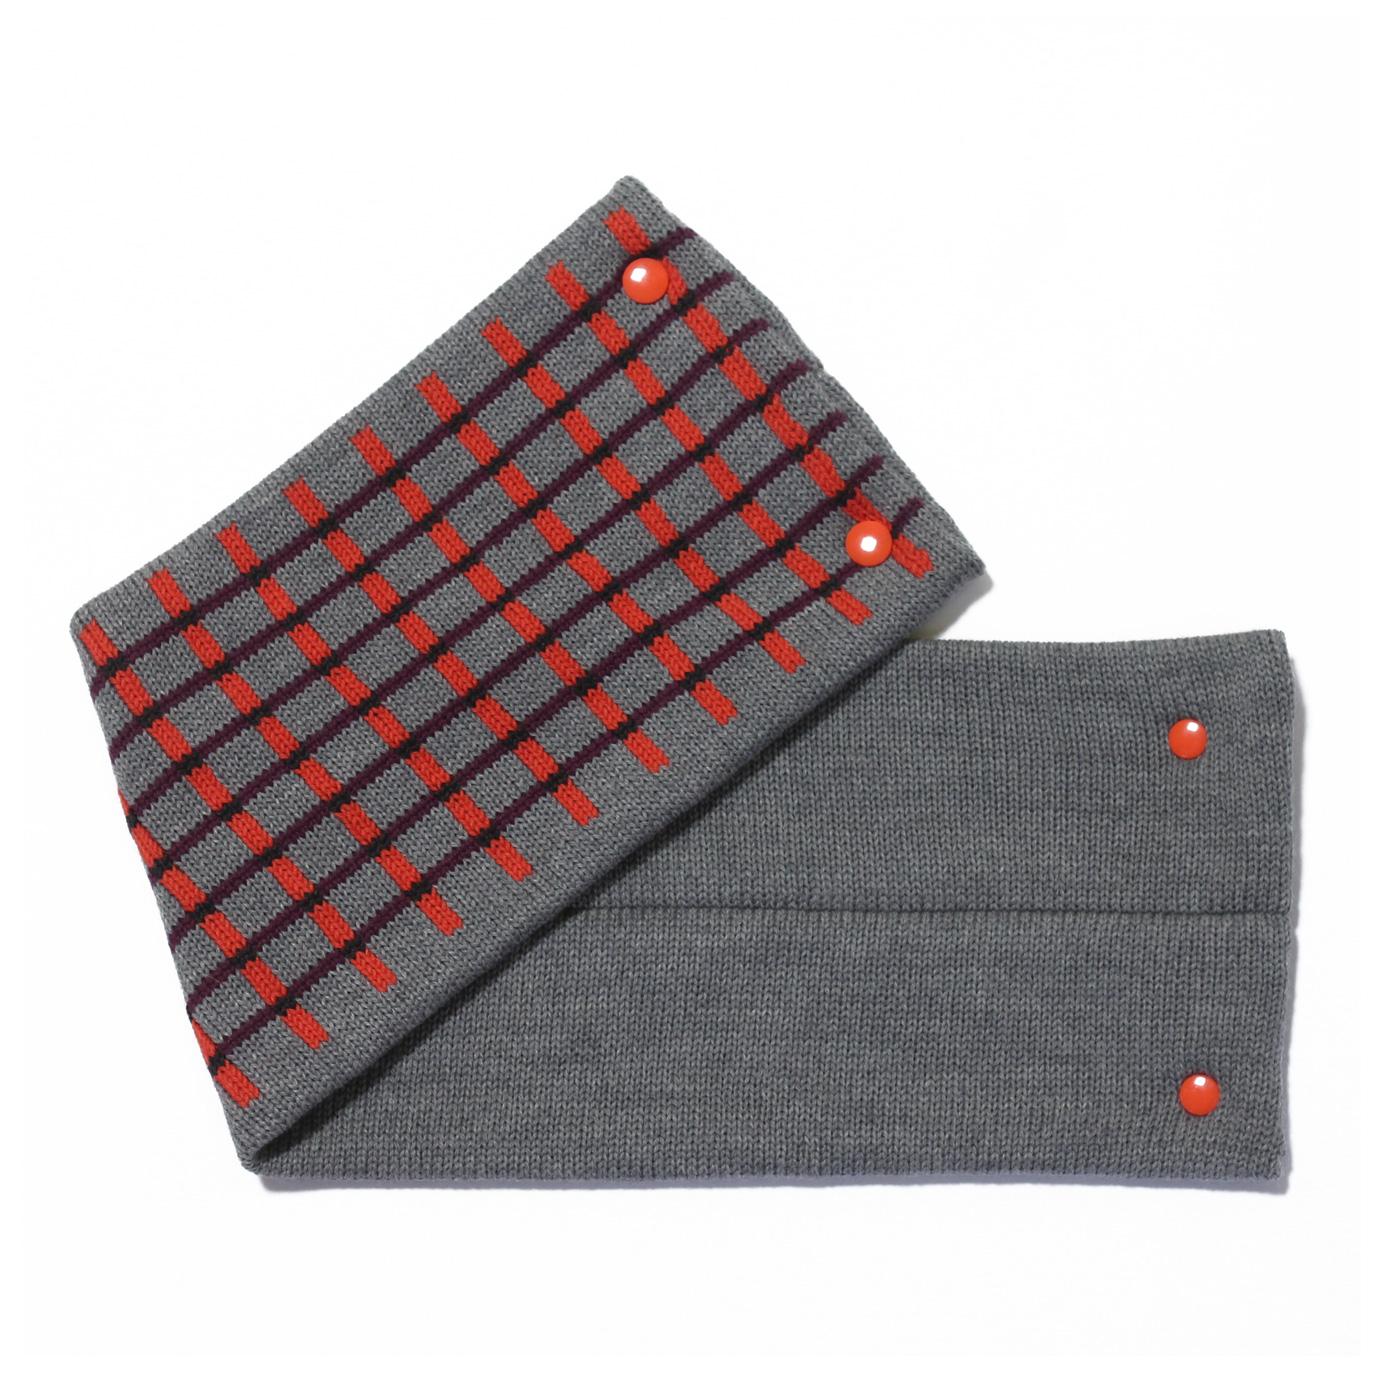 sciarpa con bottoni grigio arancio bordeaux nero